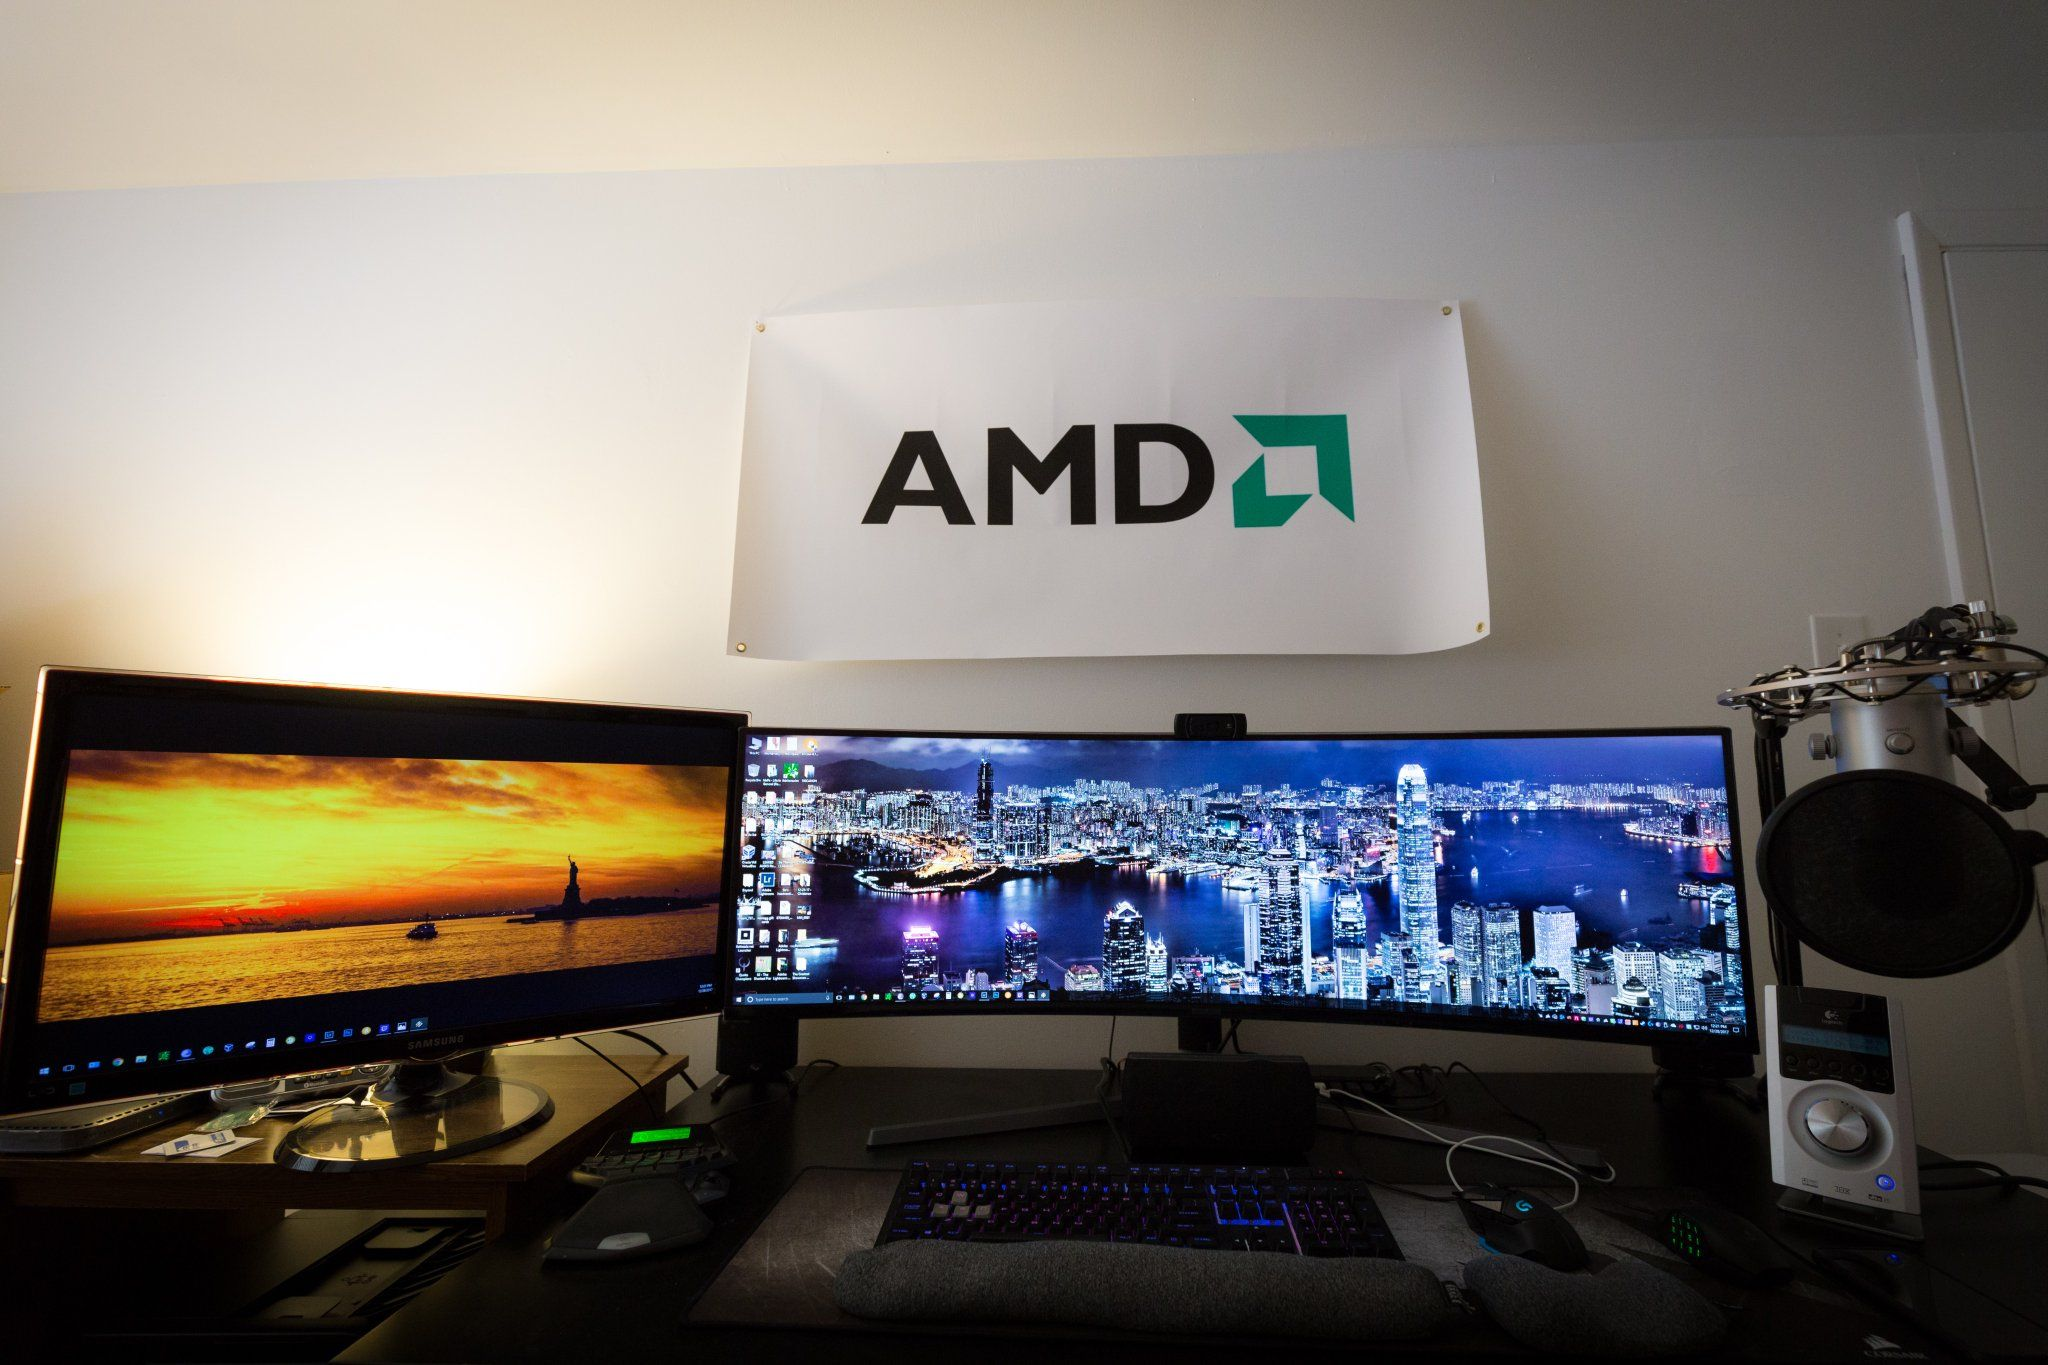 I'm loving my new Samsung 49 inch UltraWide HDR QLED Gaming Monitor